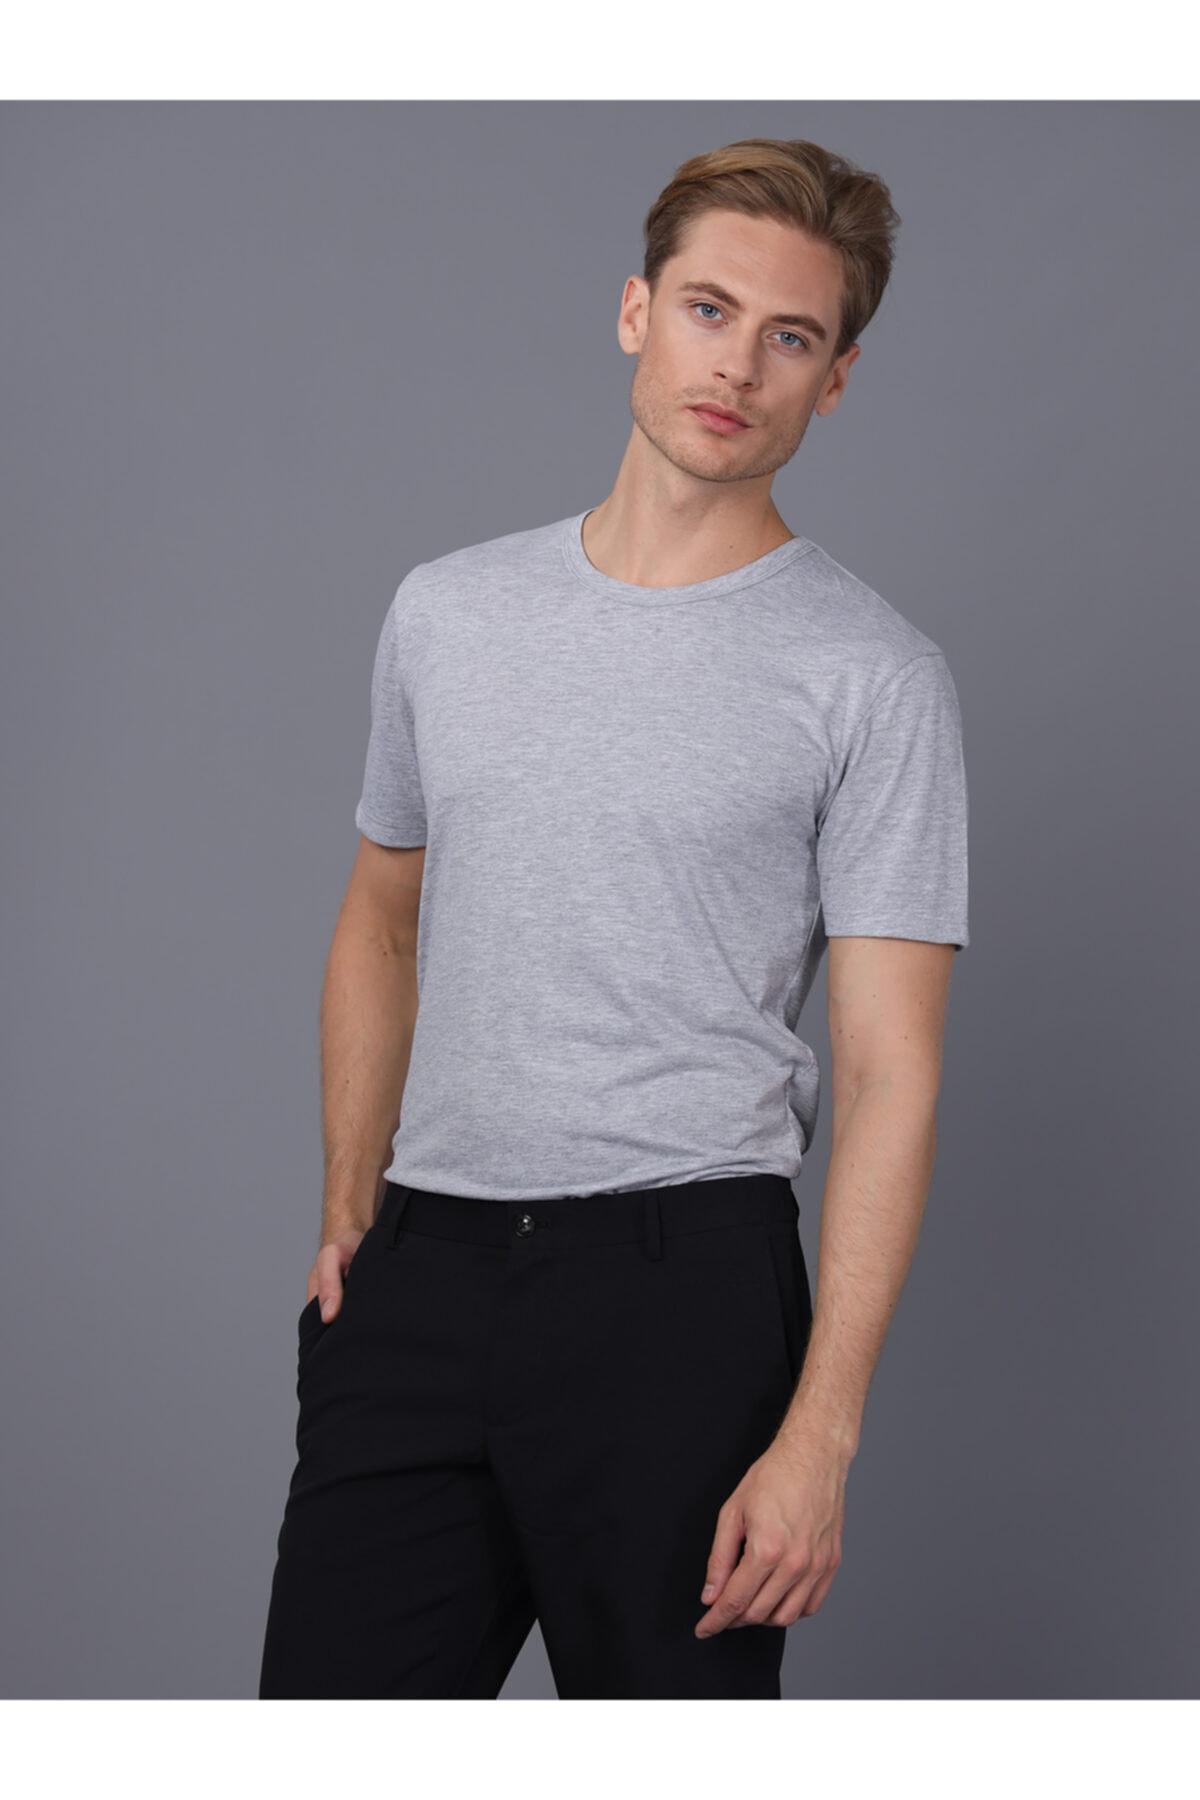 Basics&More Erkek Gri Bisiklet Yaka T-Shirt 2